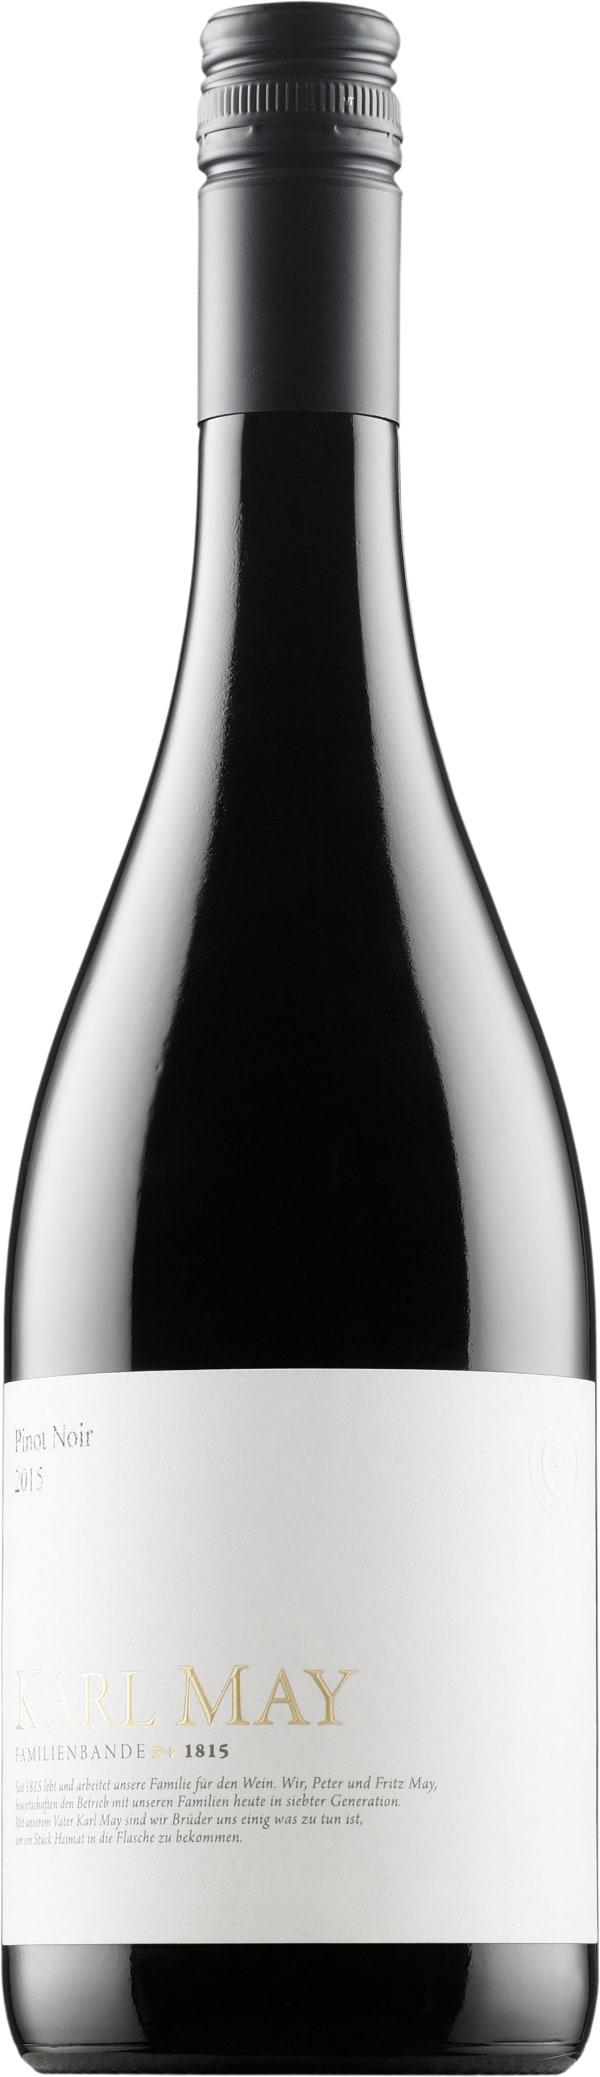 Karl May Pinot Noir 2017